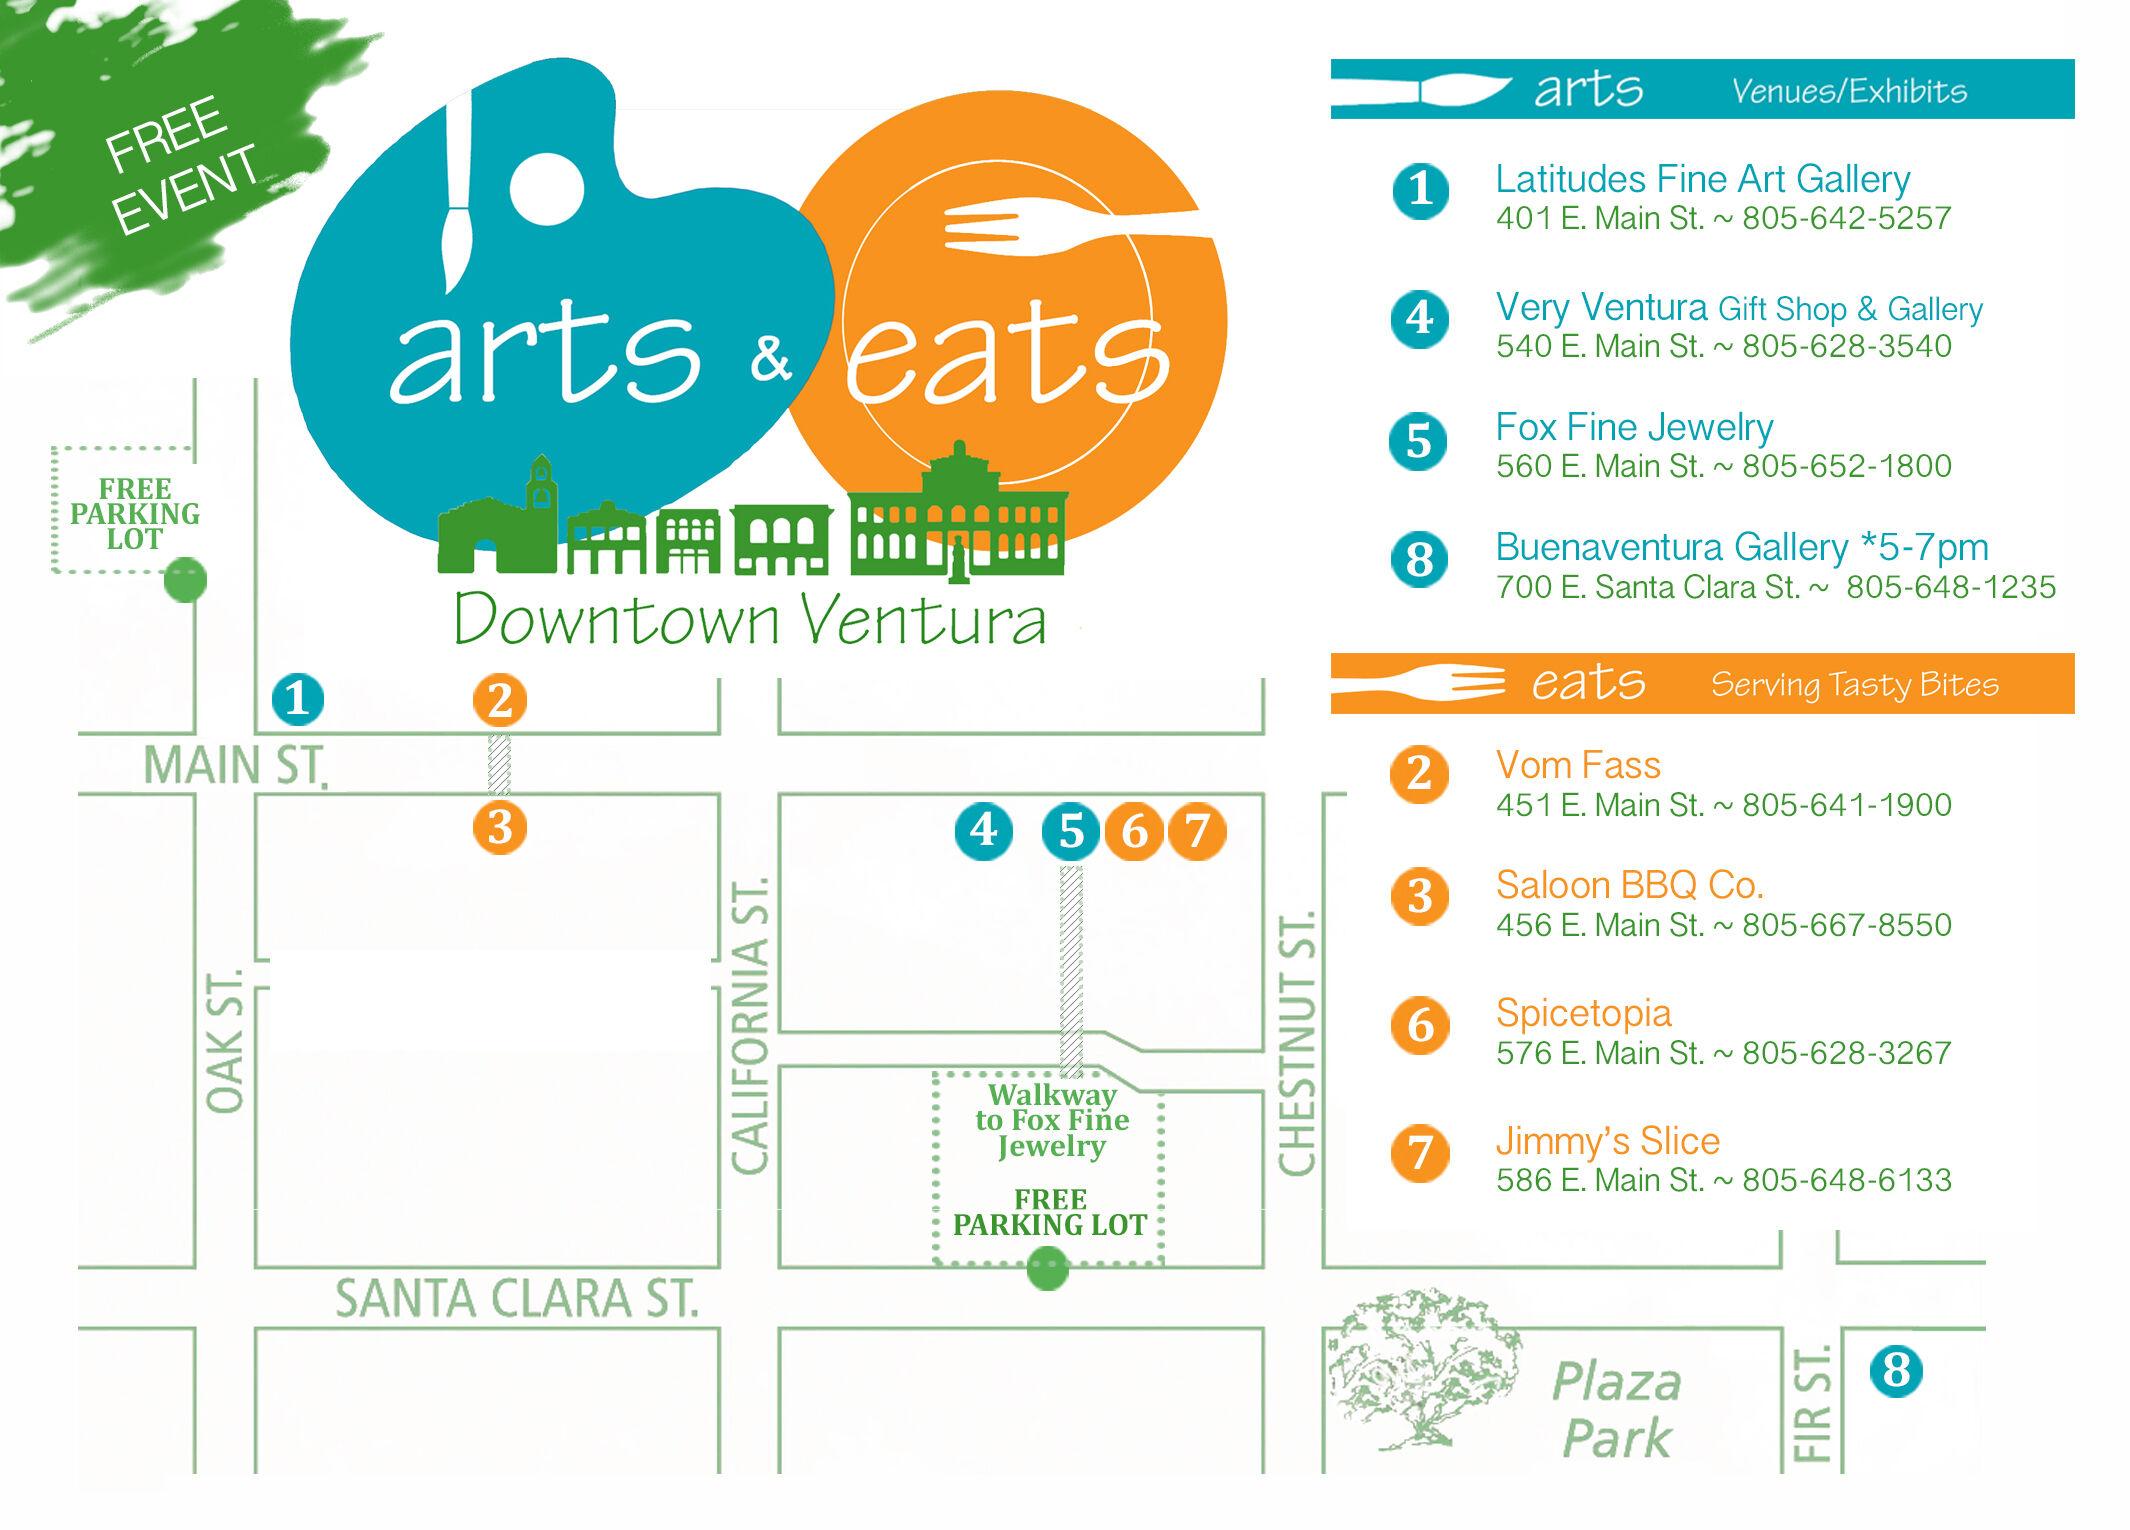 Arts & Eats – November 19th, 2016